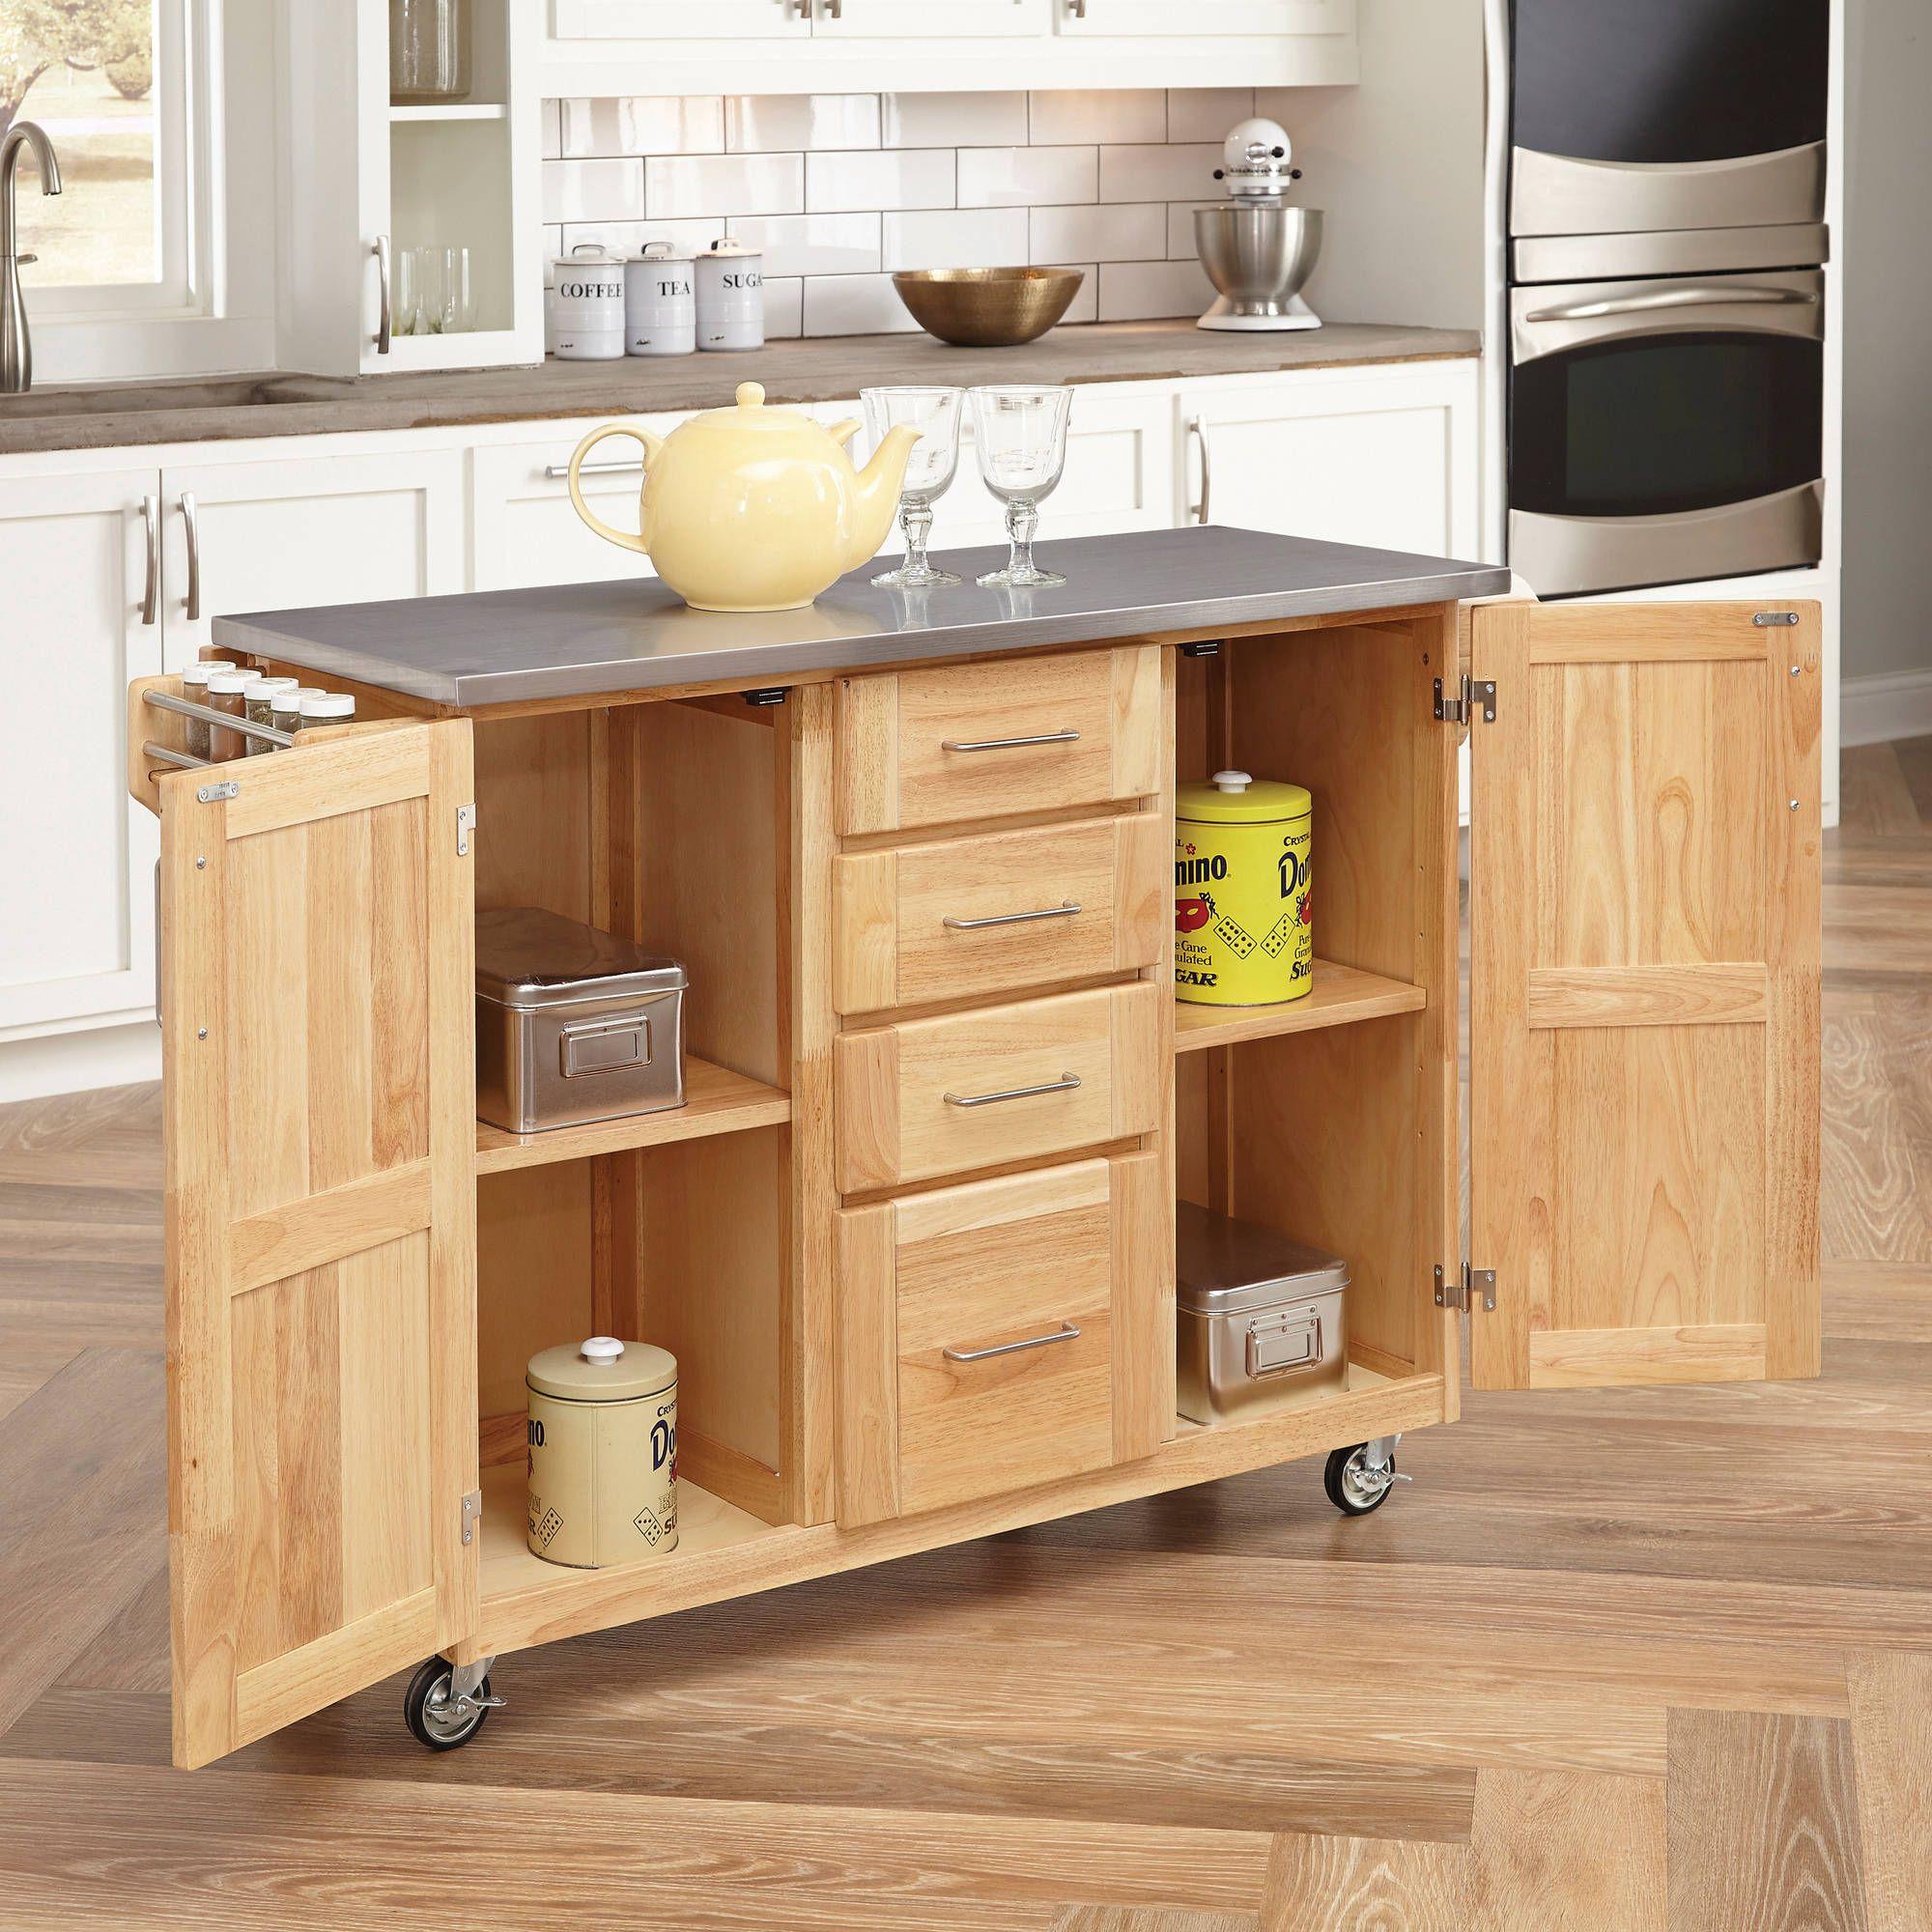 stainless steel kitchen cart butcher block